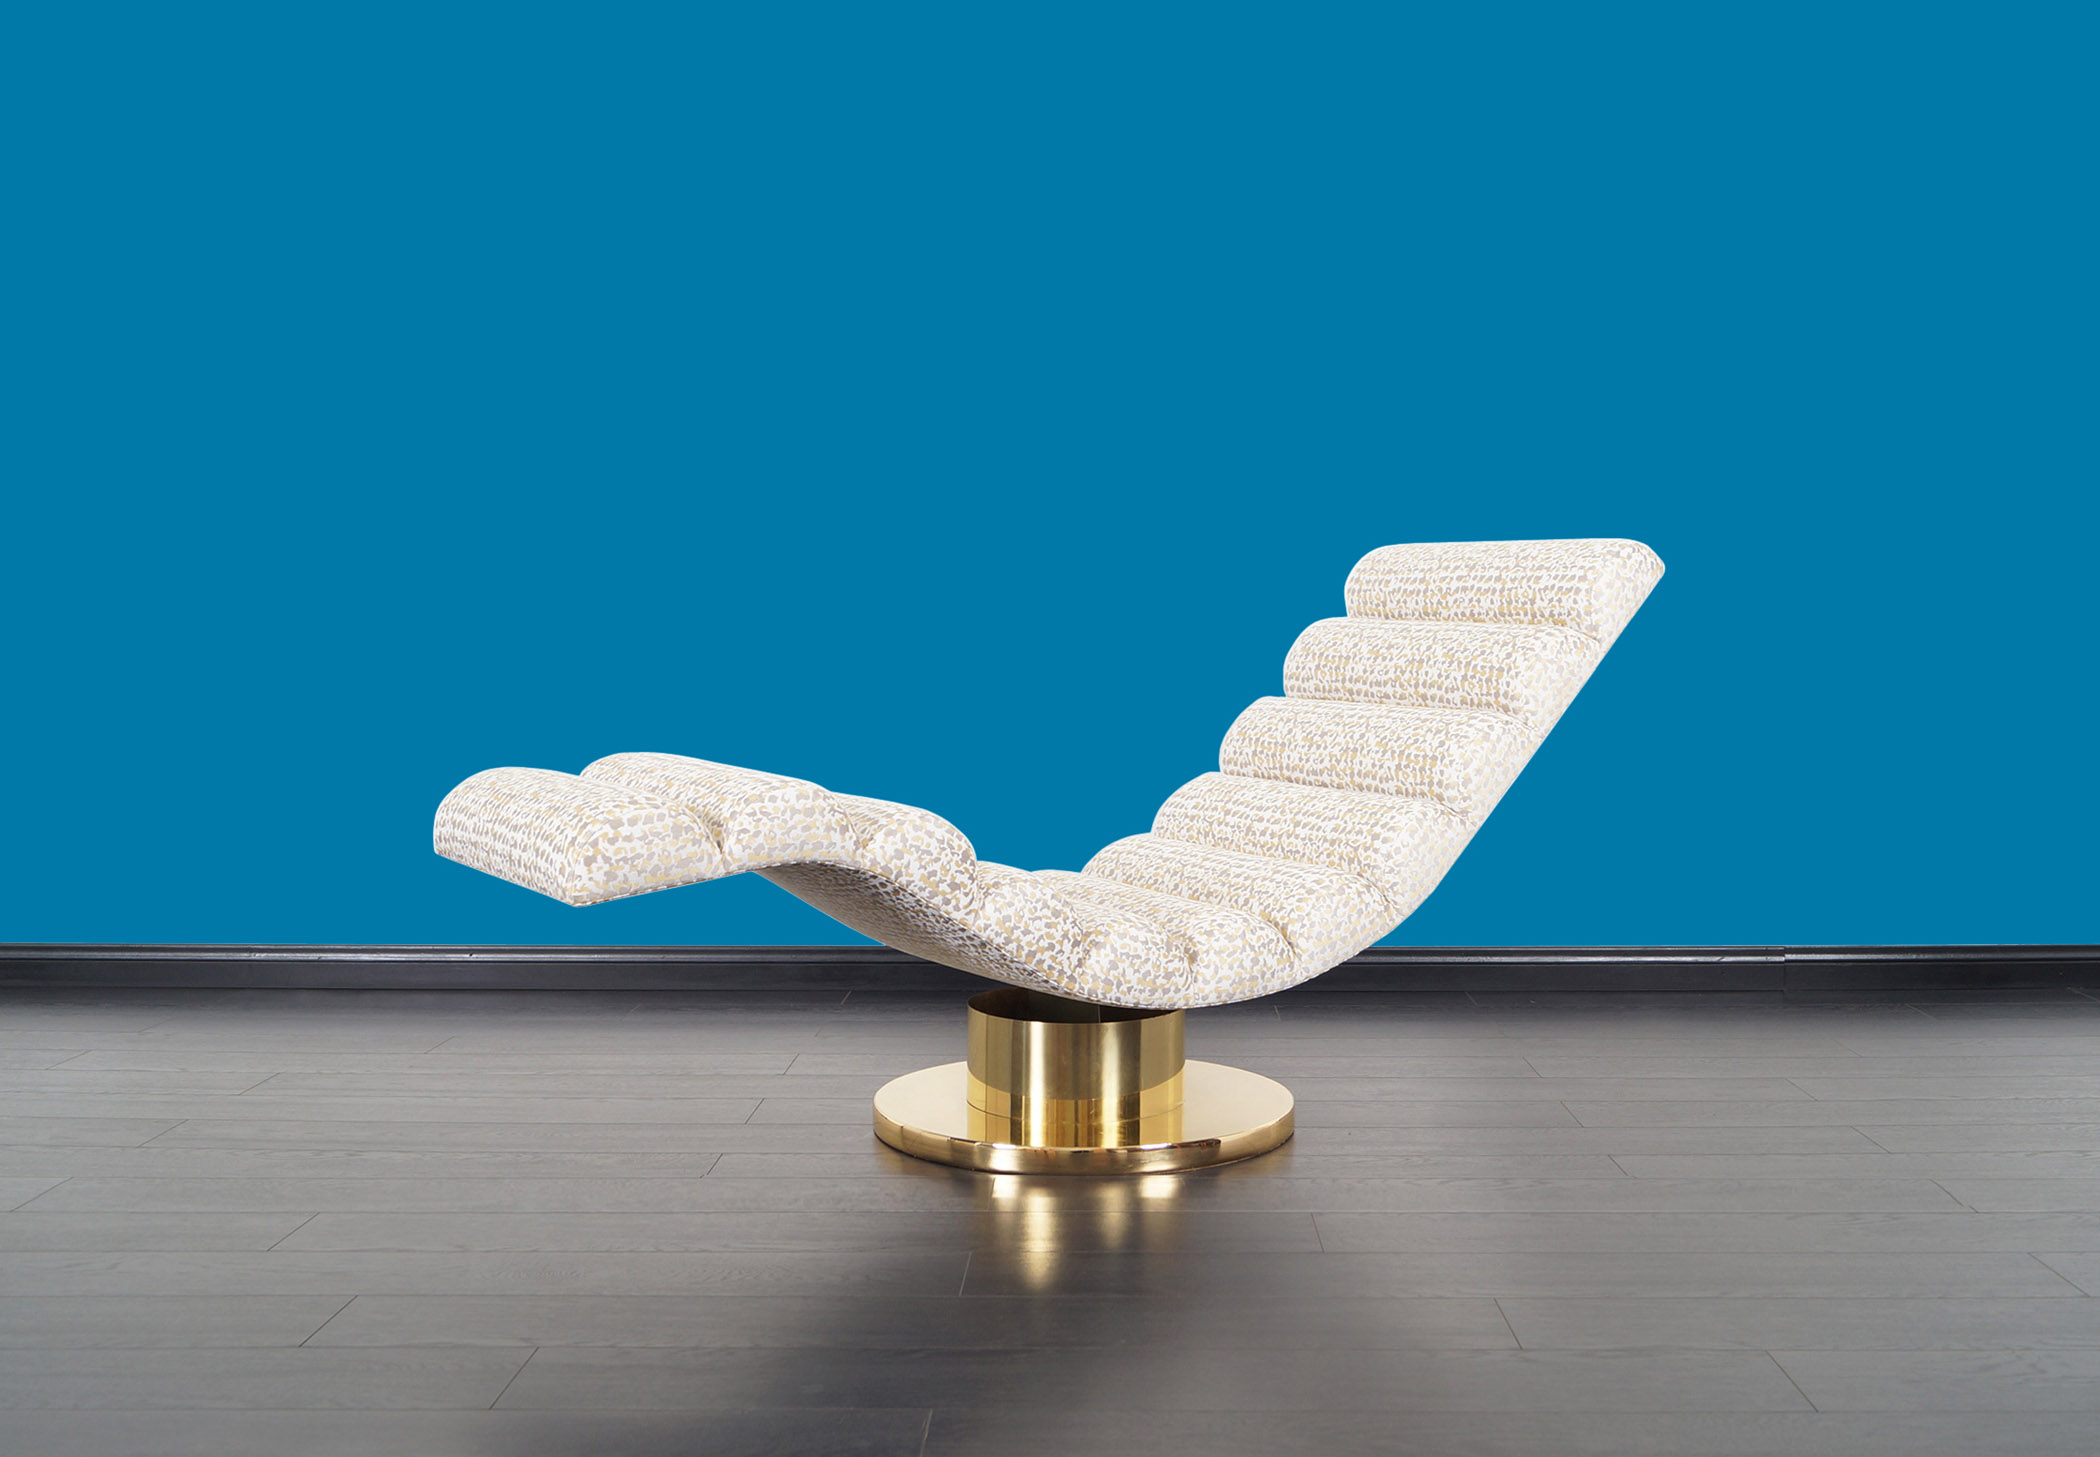 Vintage Brass Swivel Wave Chaise Lounge by Milo Baughman